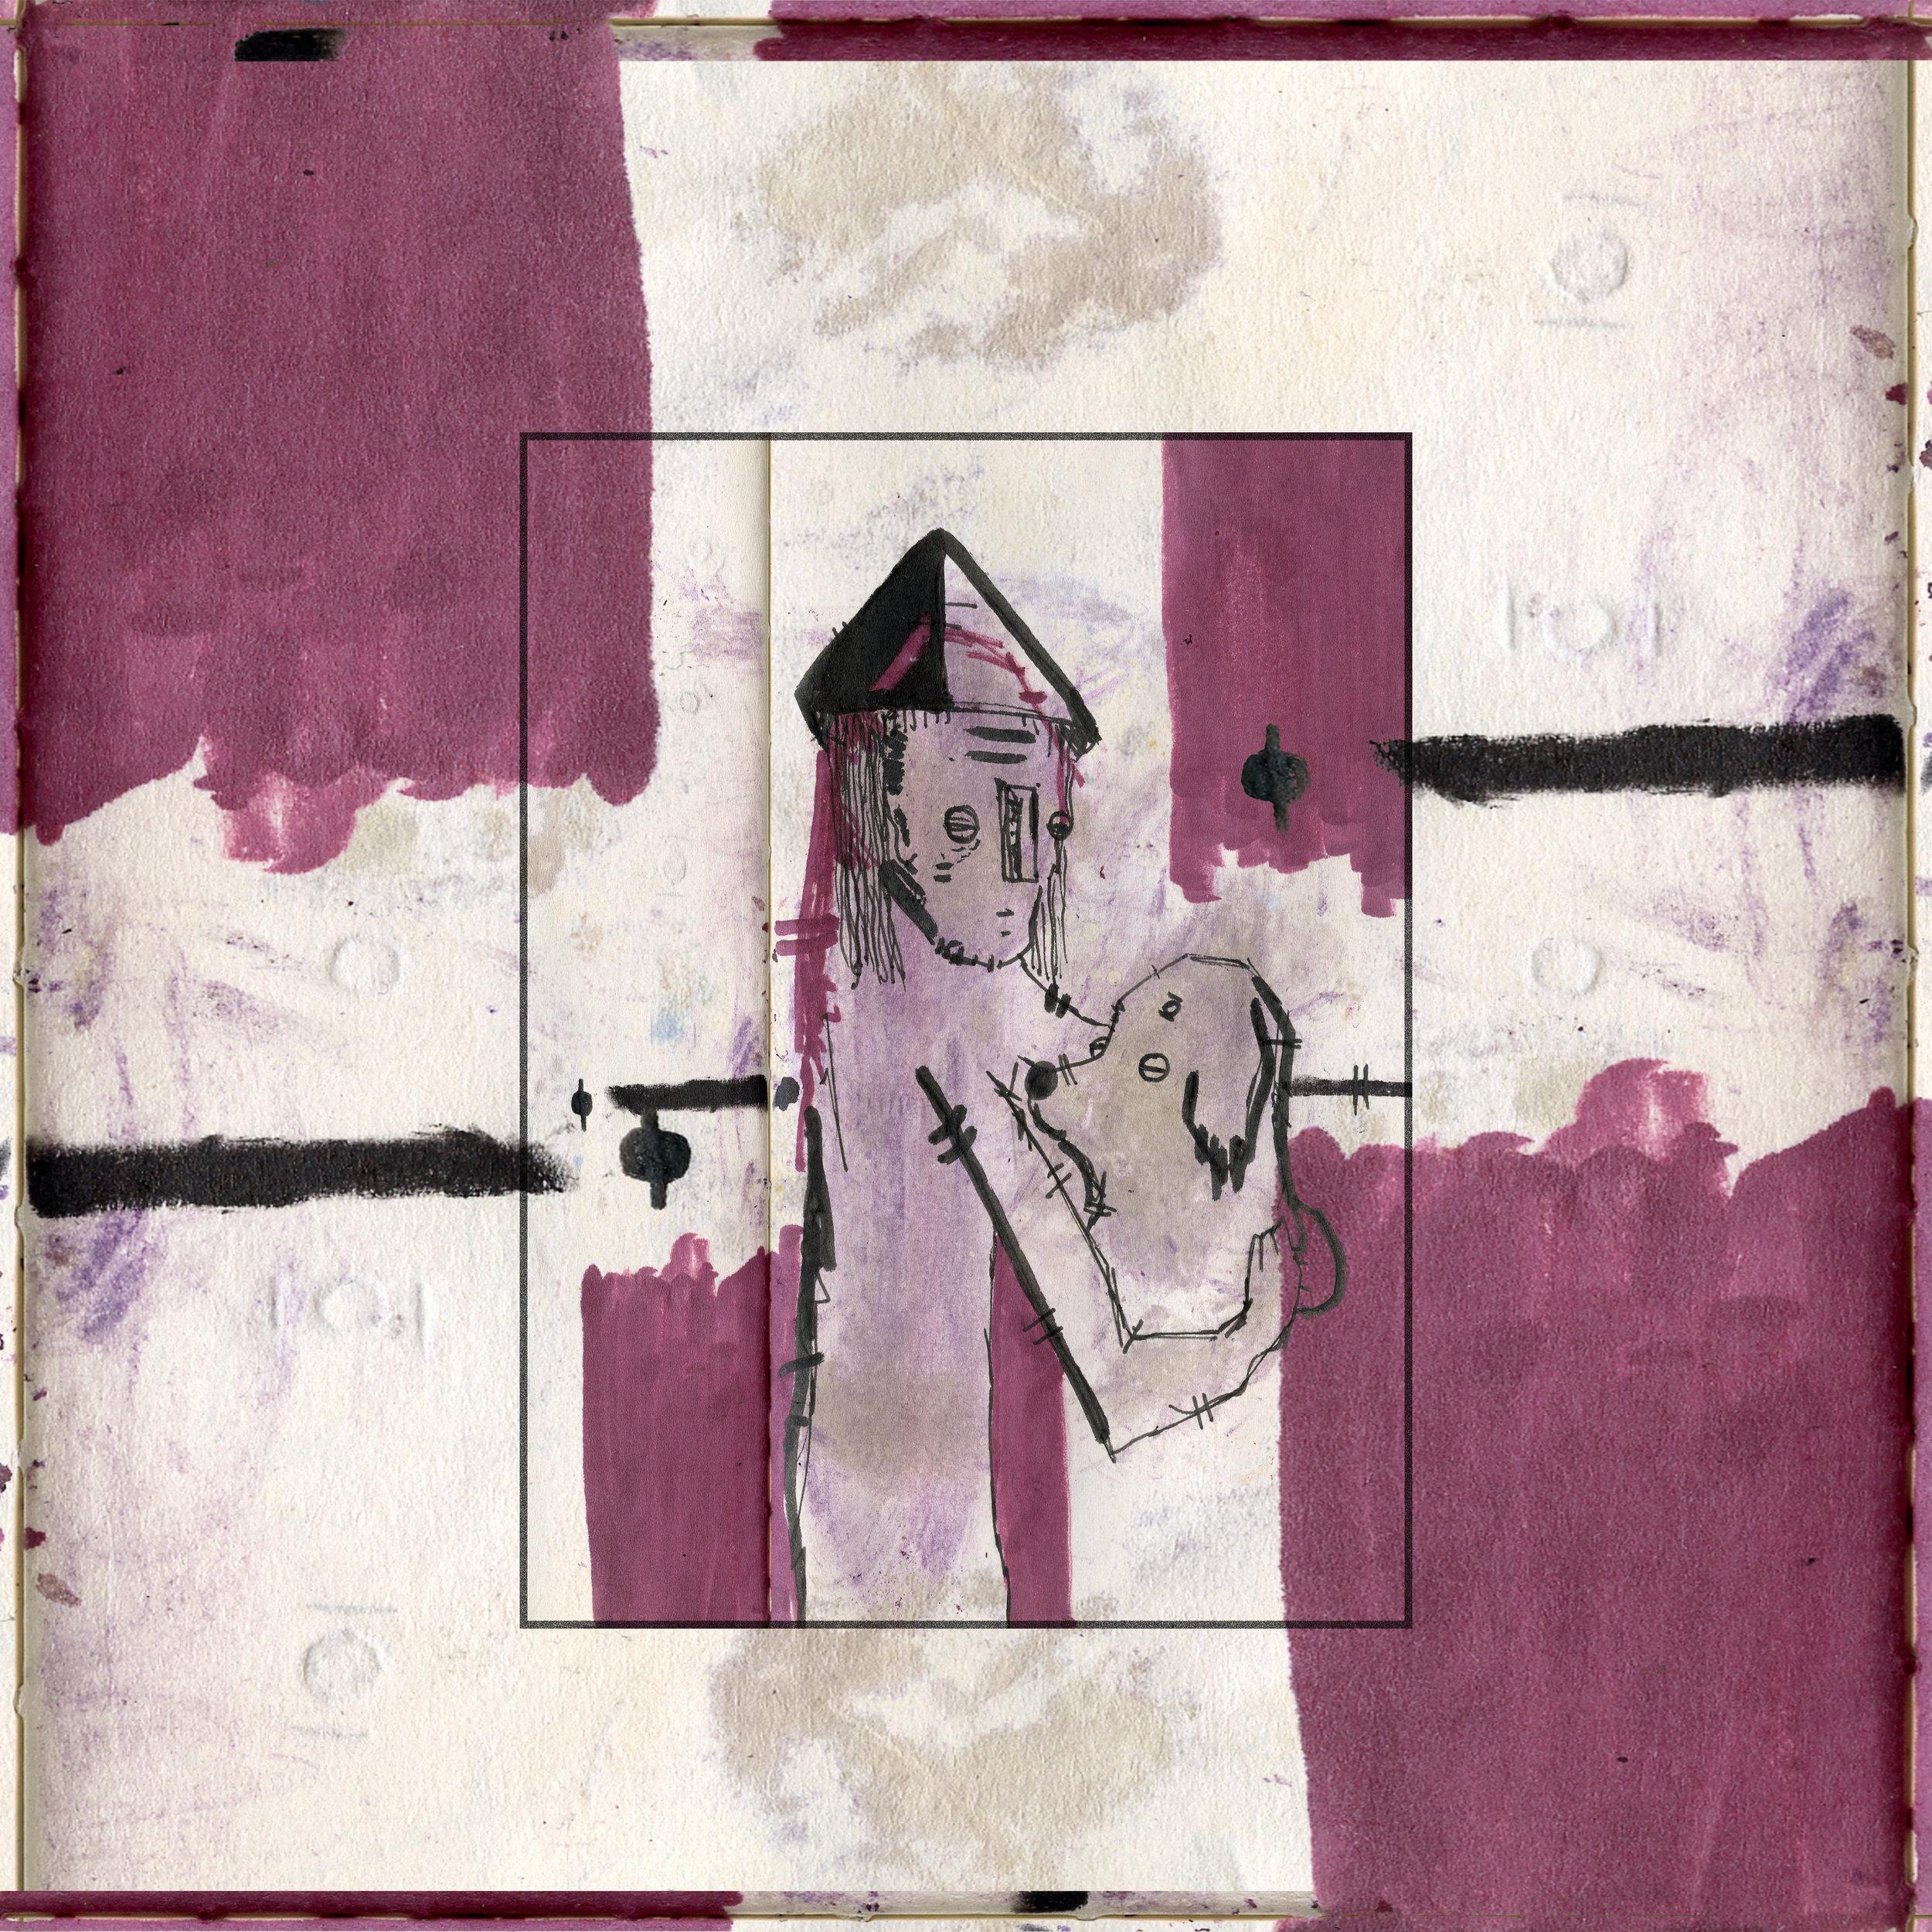 Crag_Mask_Bend_Album_Art_Front.jpg